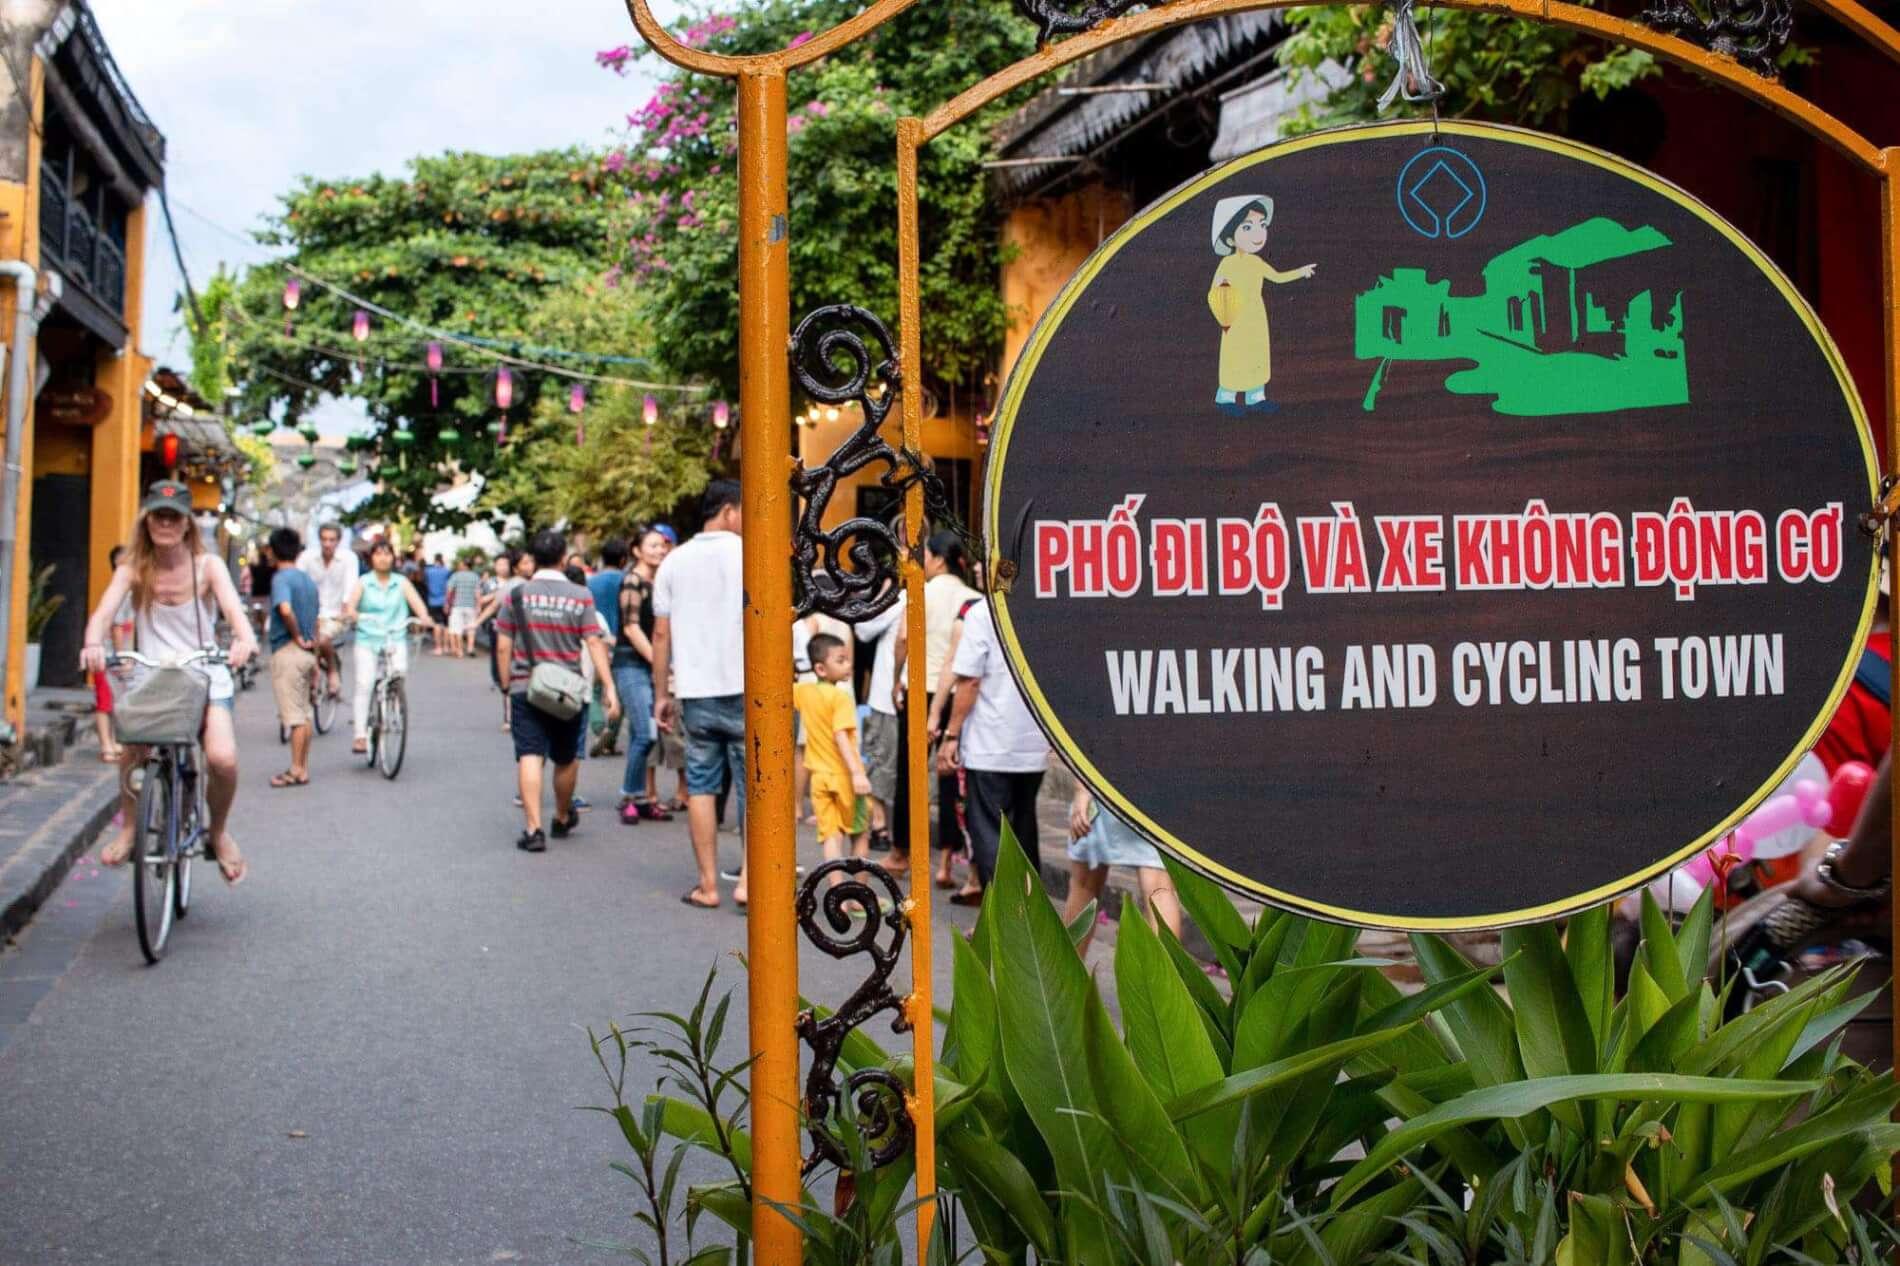 Pedestrian area in Hoi An Ancient Town